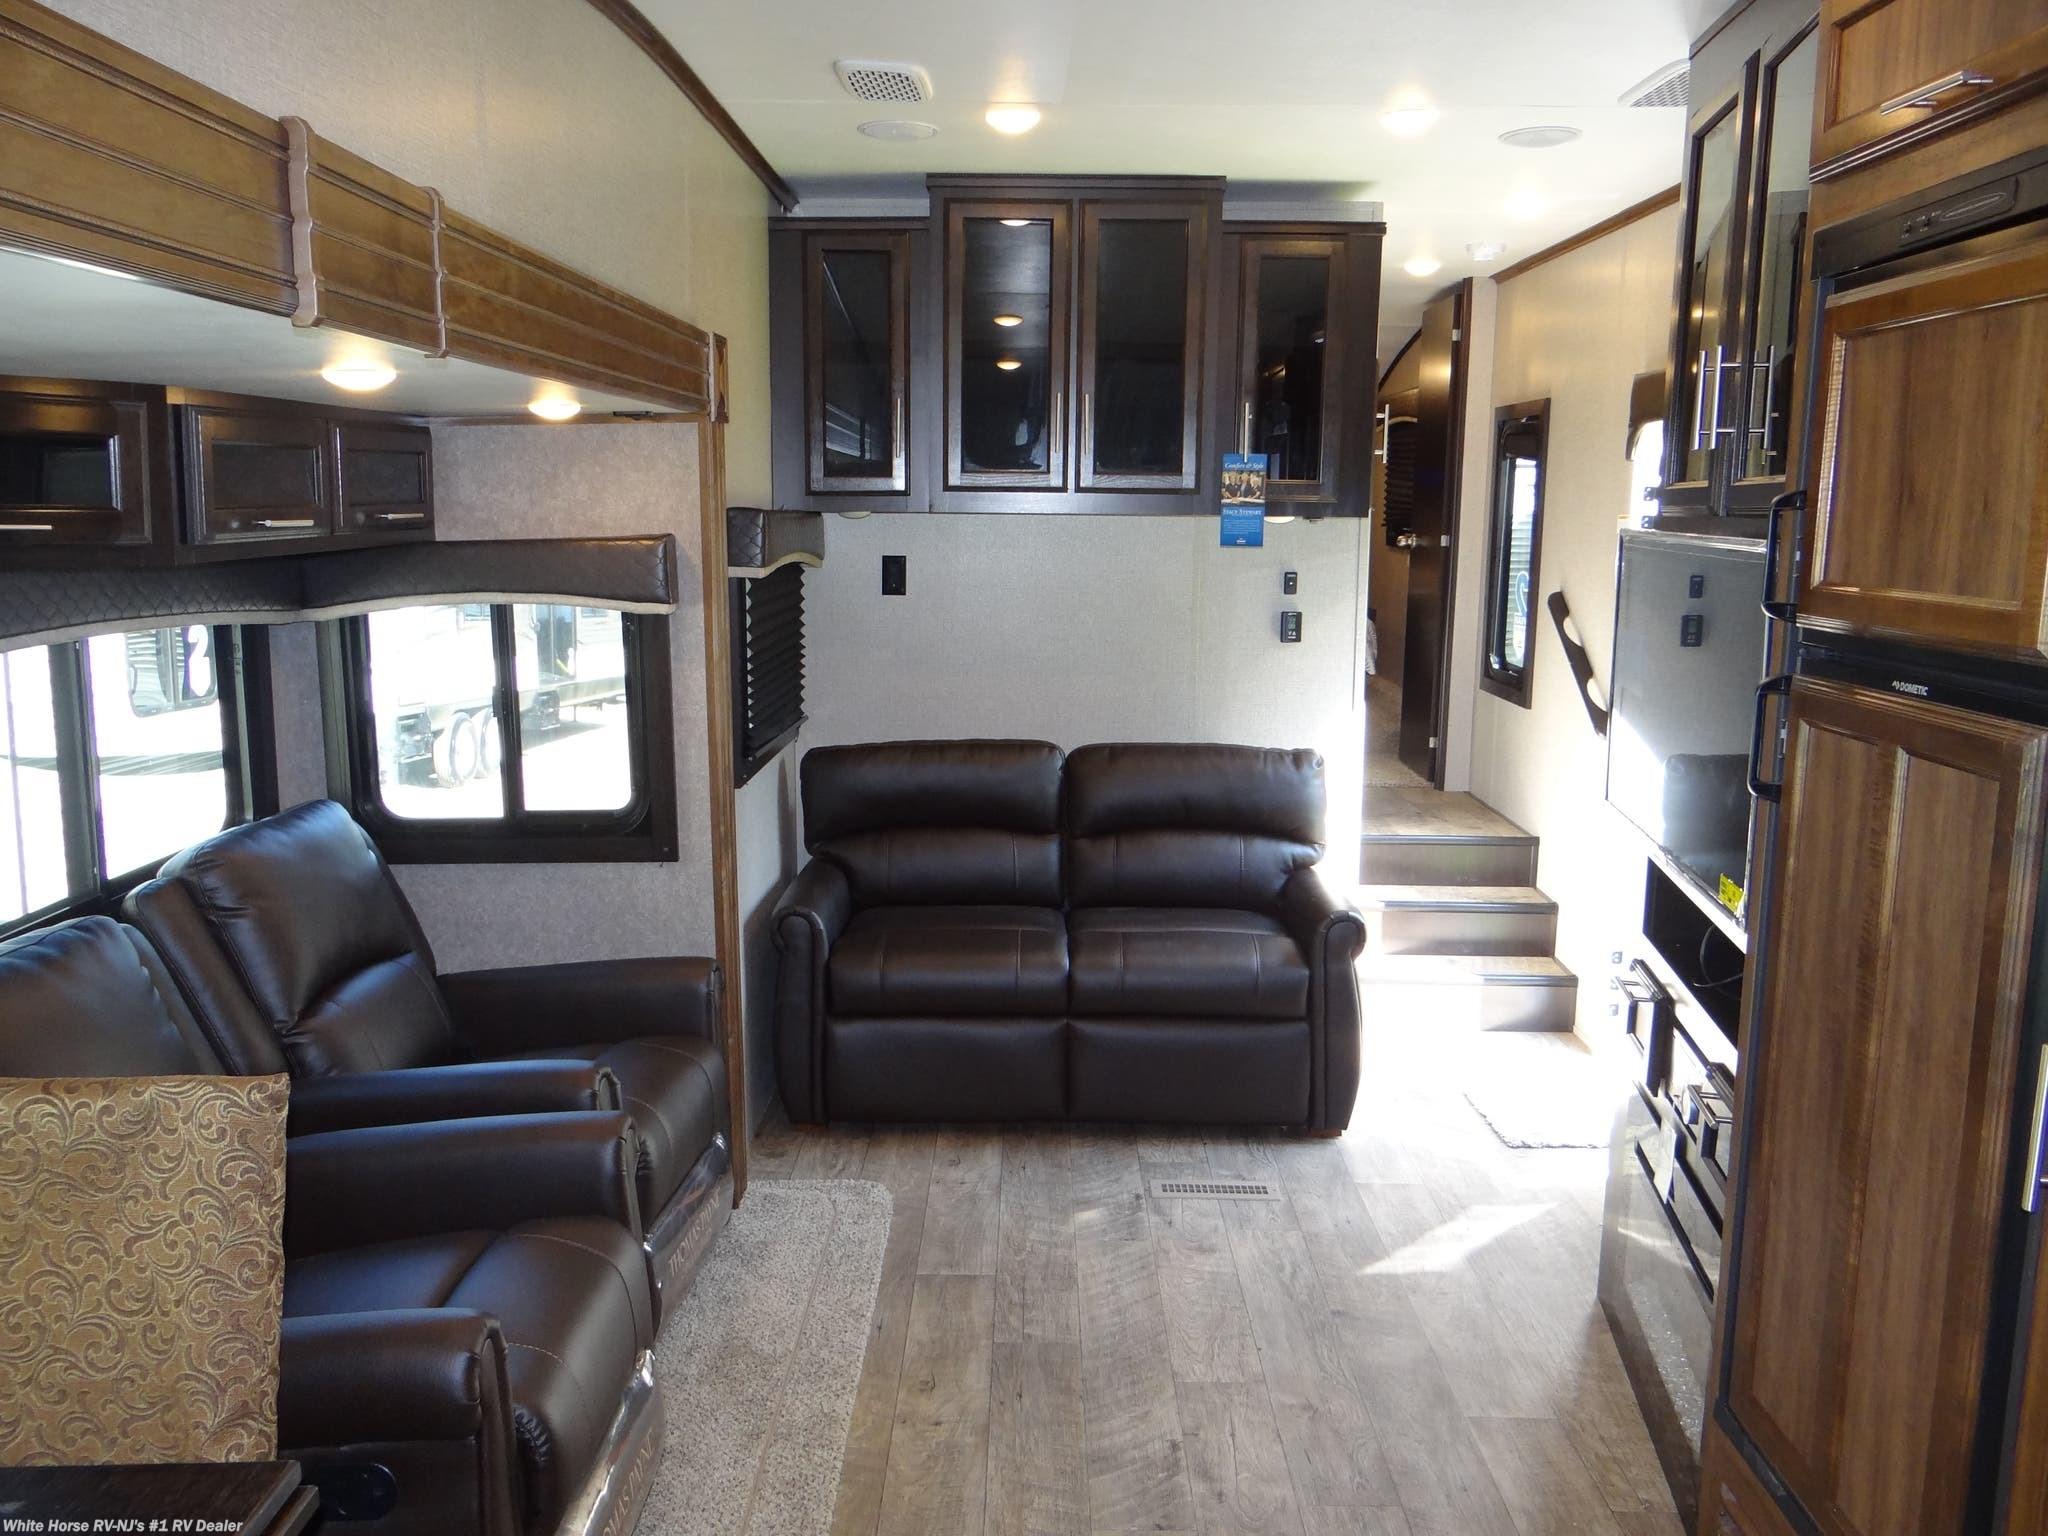 ... Fifth Wheel New In Williamstown White Horse RV Center (Williamstown)  2019 Eagle HT 30.5MLOK Rear Kitchen Double Slideout